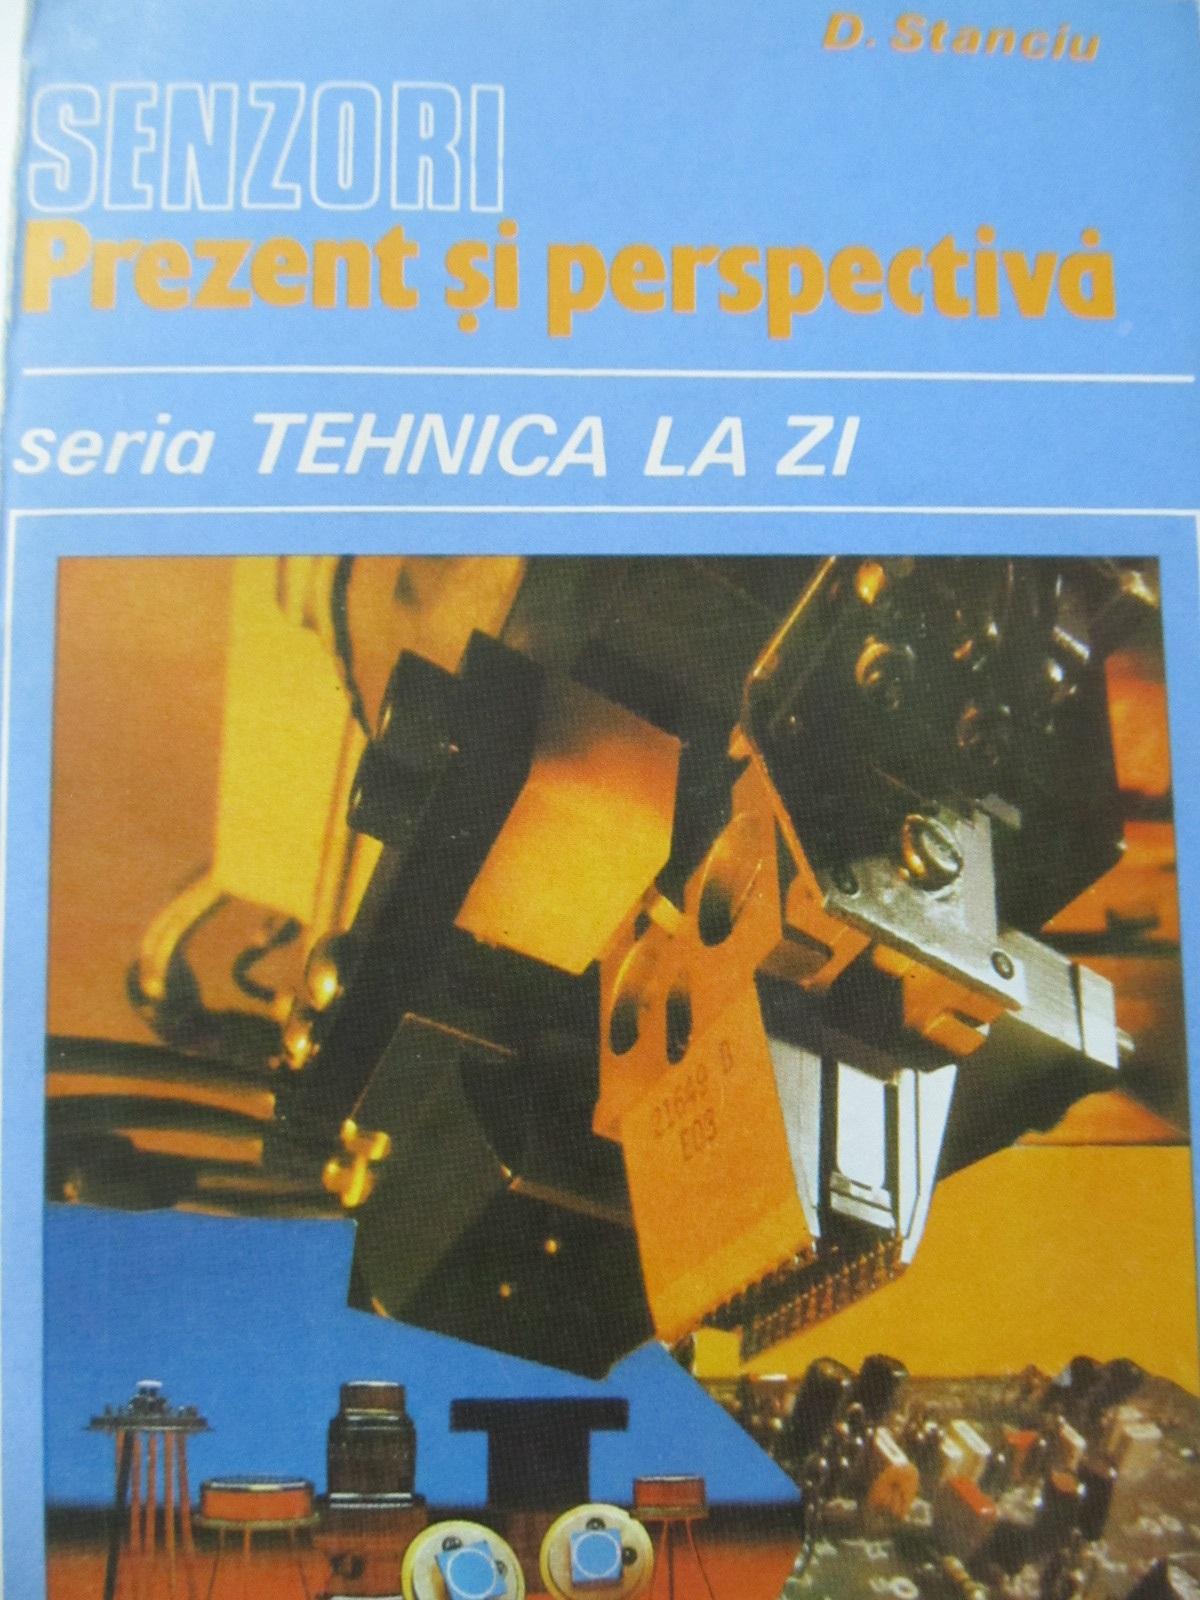 Senzori prezent si perspectiva - D. Stanciu | Detalii carte